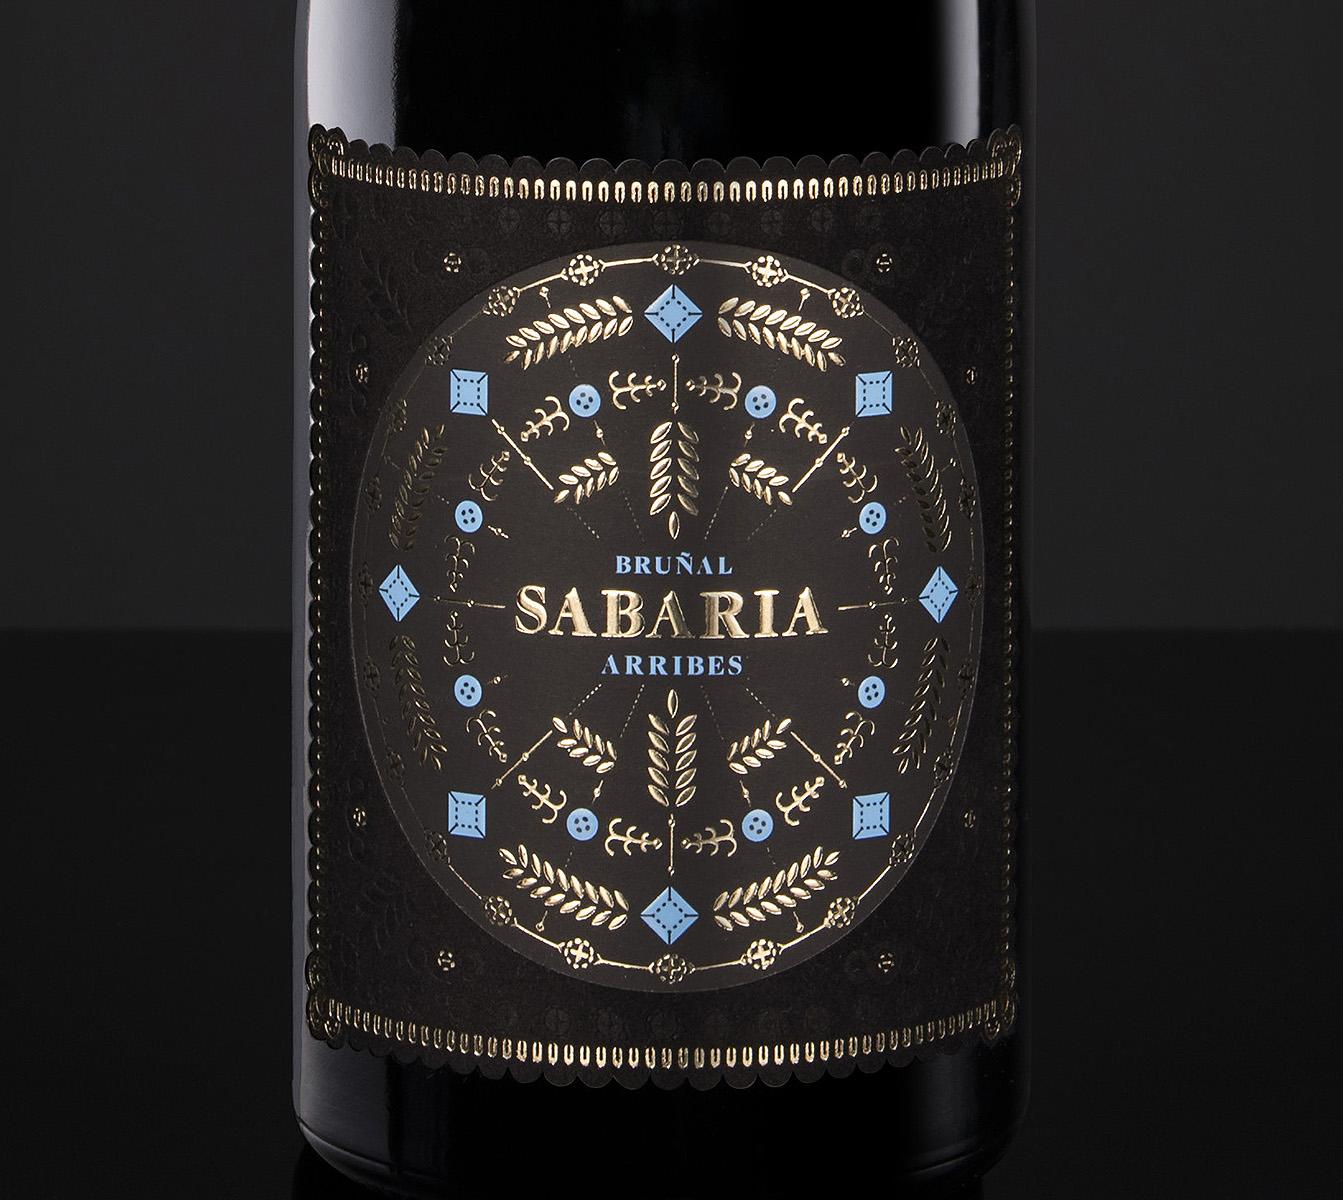 New Design for Sabaria